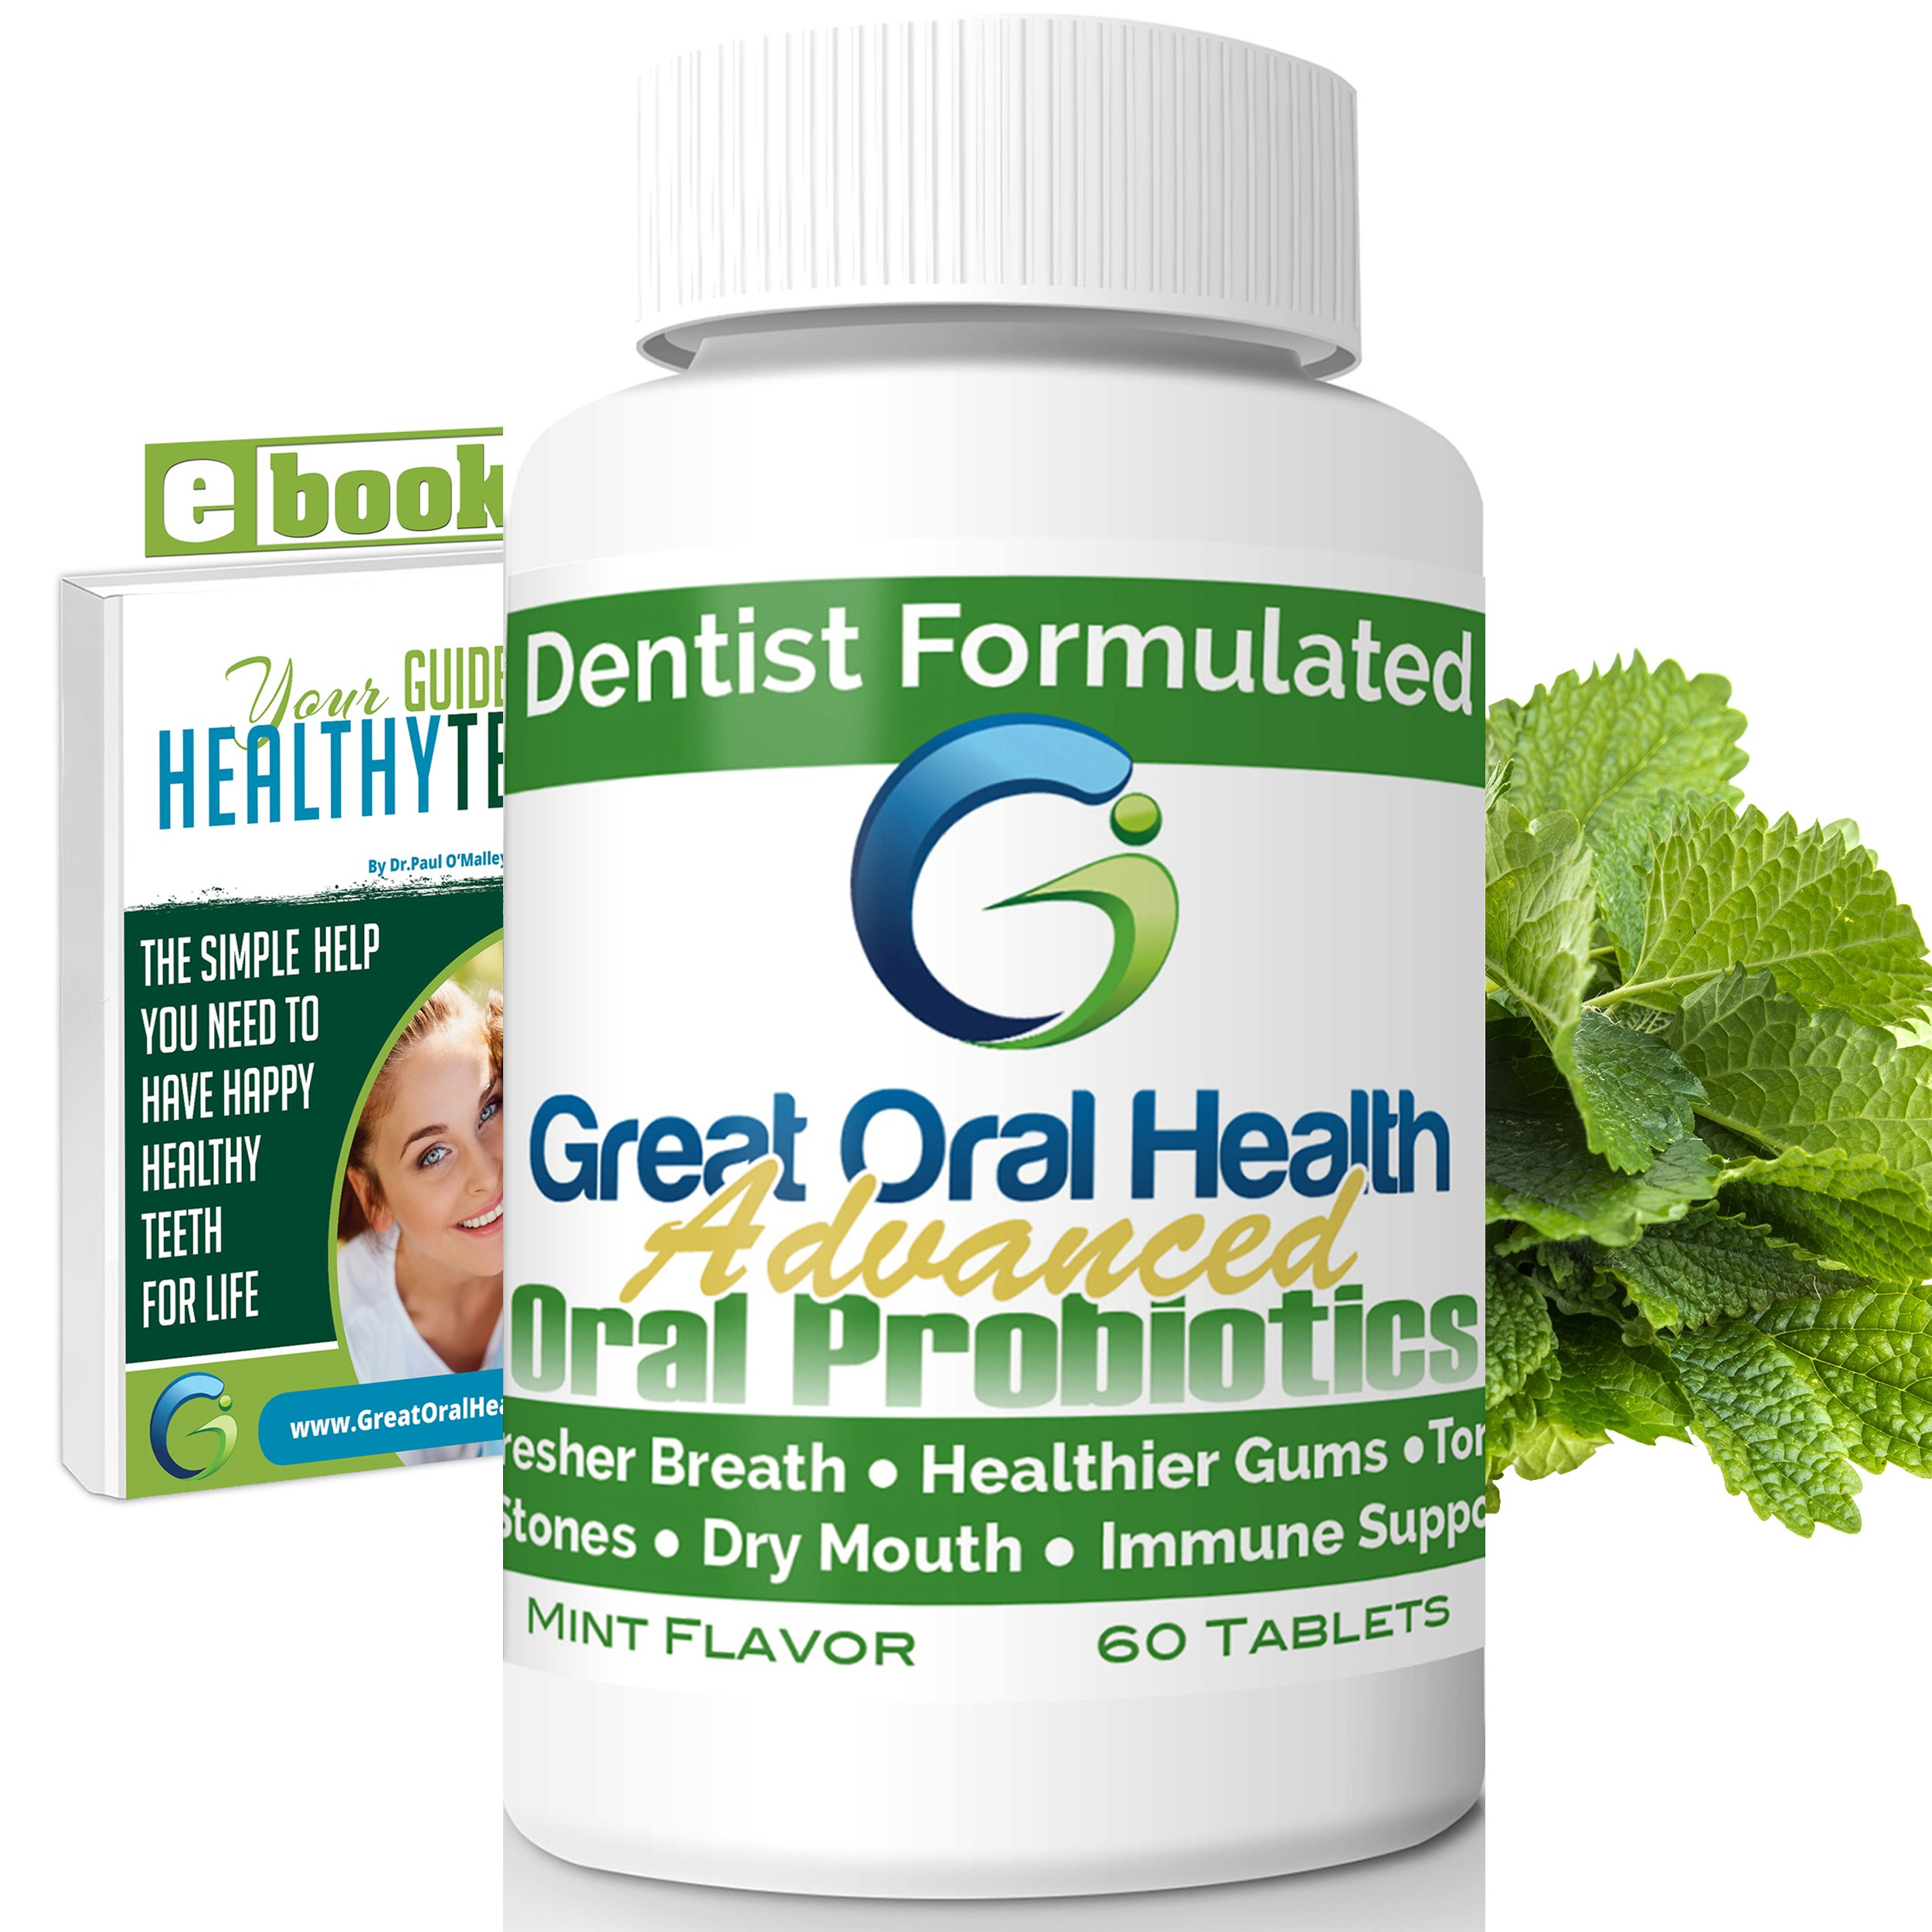 probiotics garden k vegan raw code you s the sub of glory trust for vitamin capsules health name nature life asp complex kids details